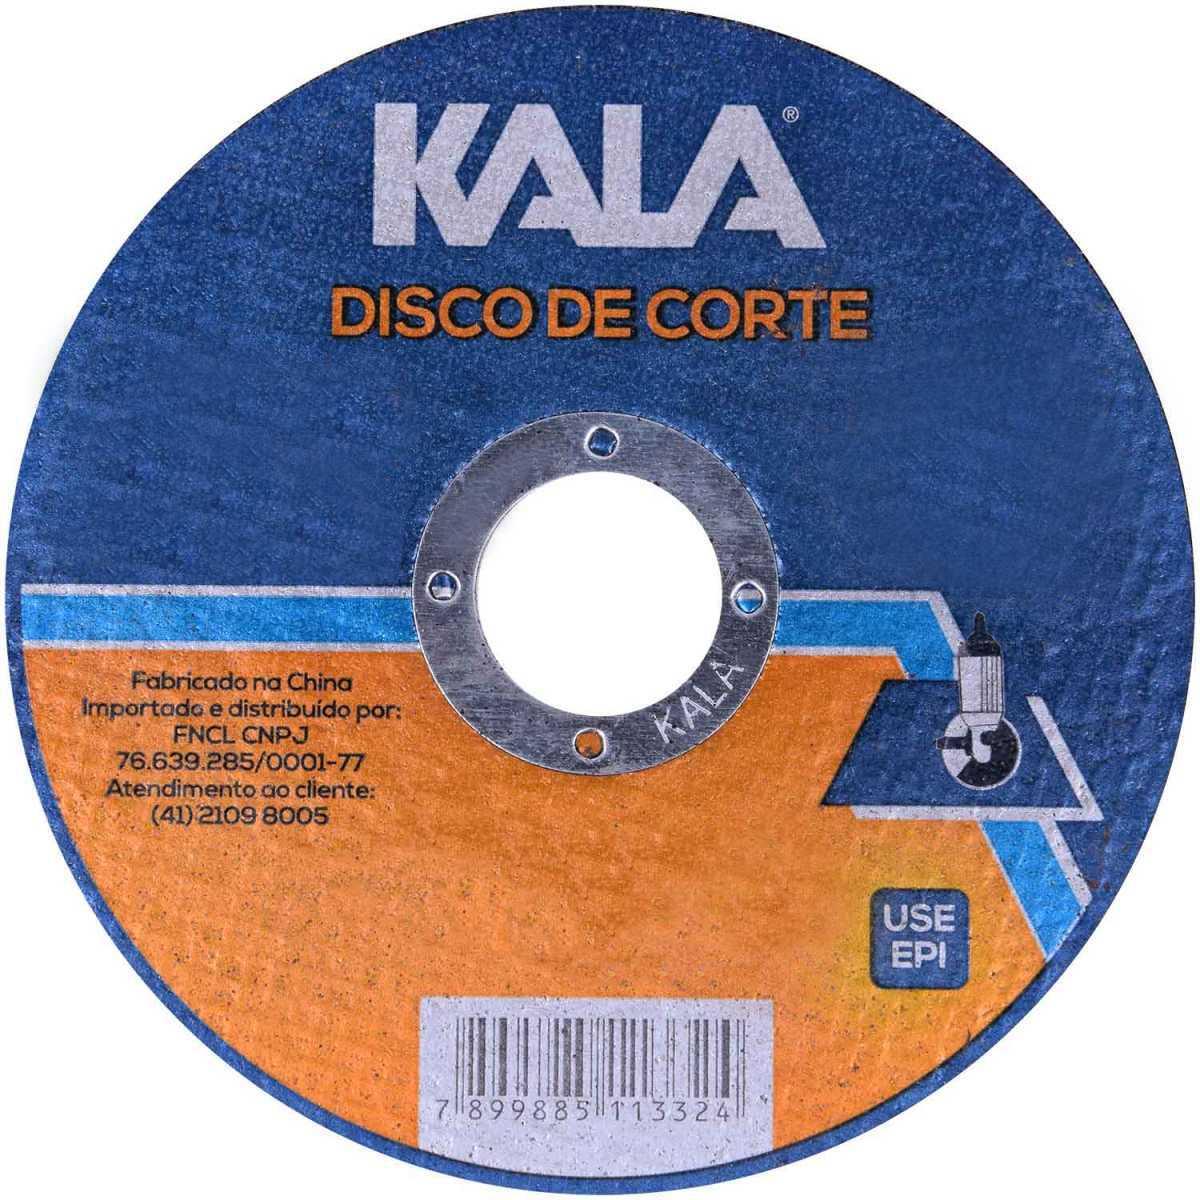 Disco de Corte Inox 115Mmx1Mmx22,23Mm Kala 100 Peças